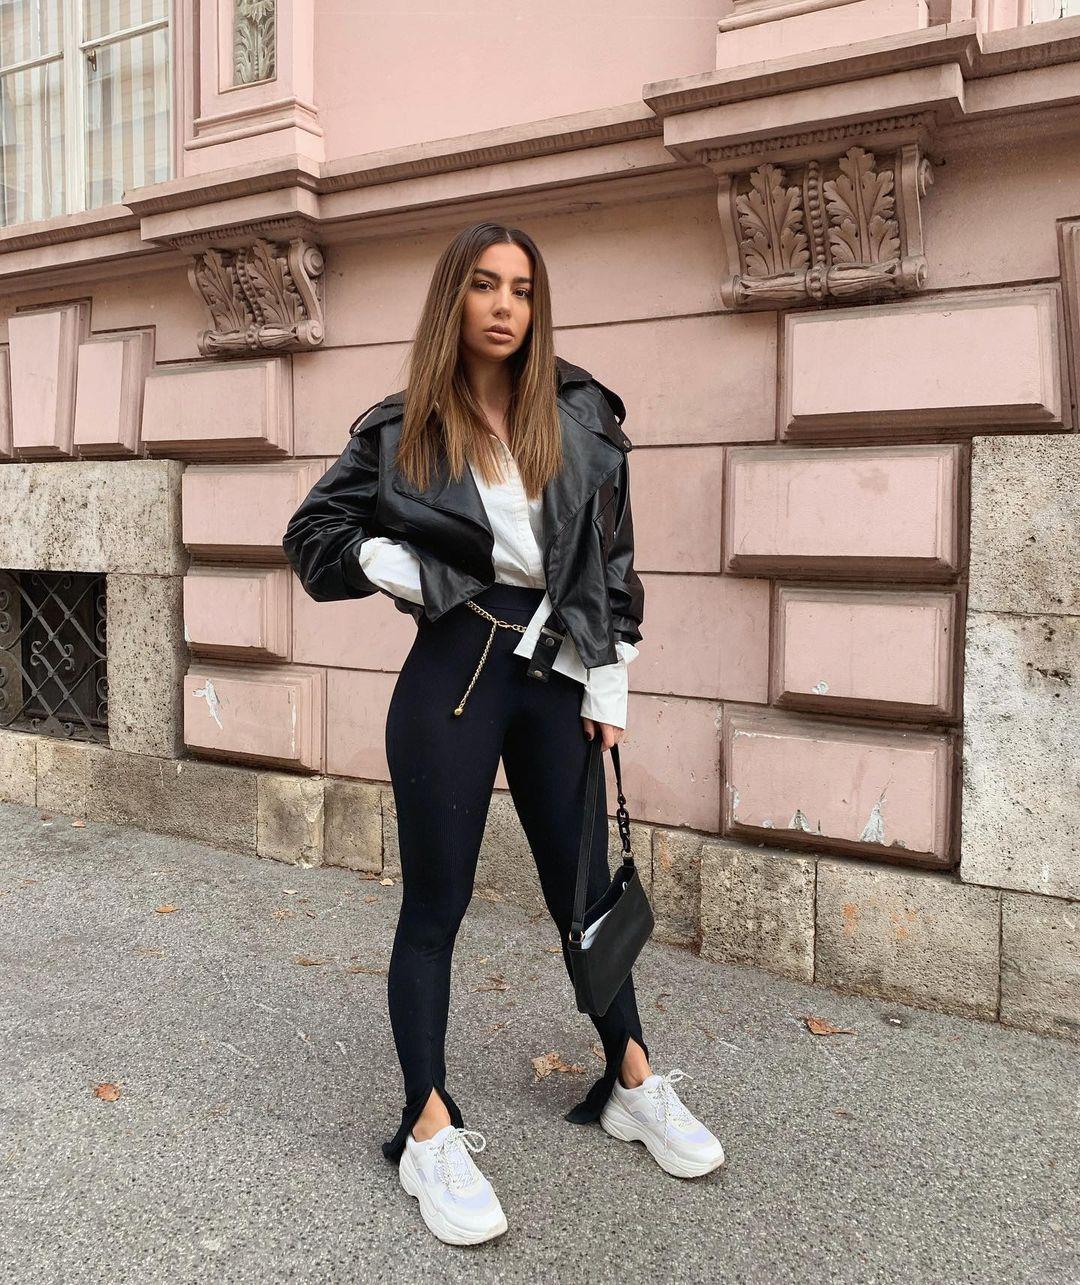 Jelena-Peric-Wallpapers-Insta-Fit-Bio-3